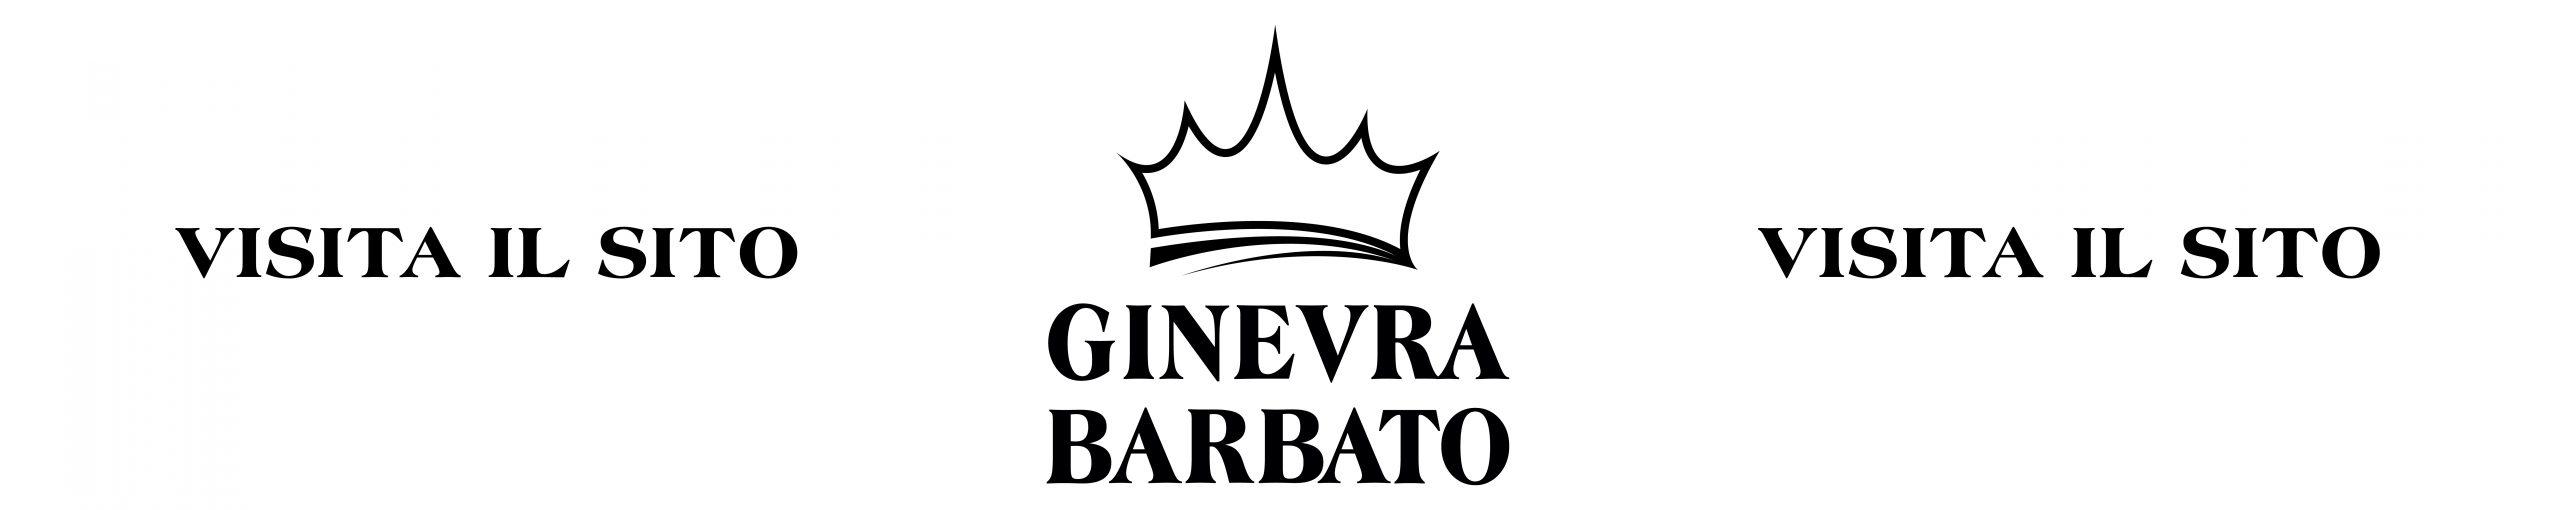 ginevra-barbato-calzature-scaled.jpg